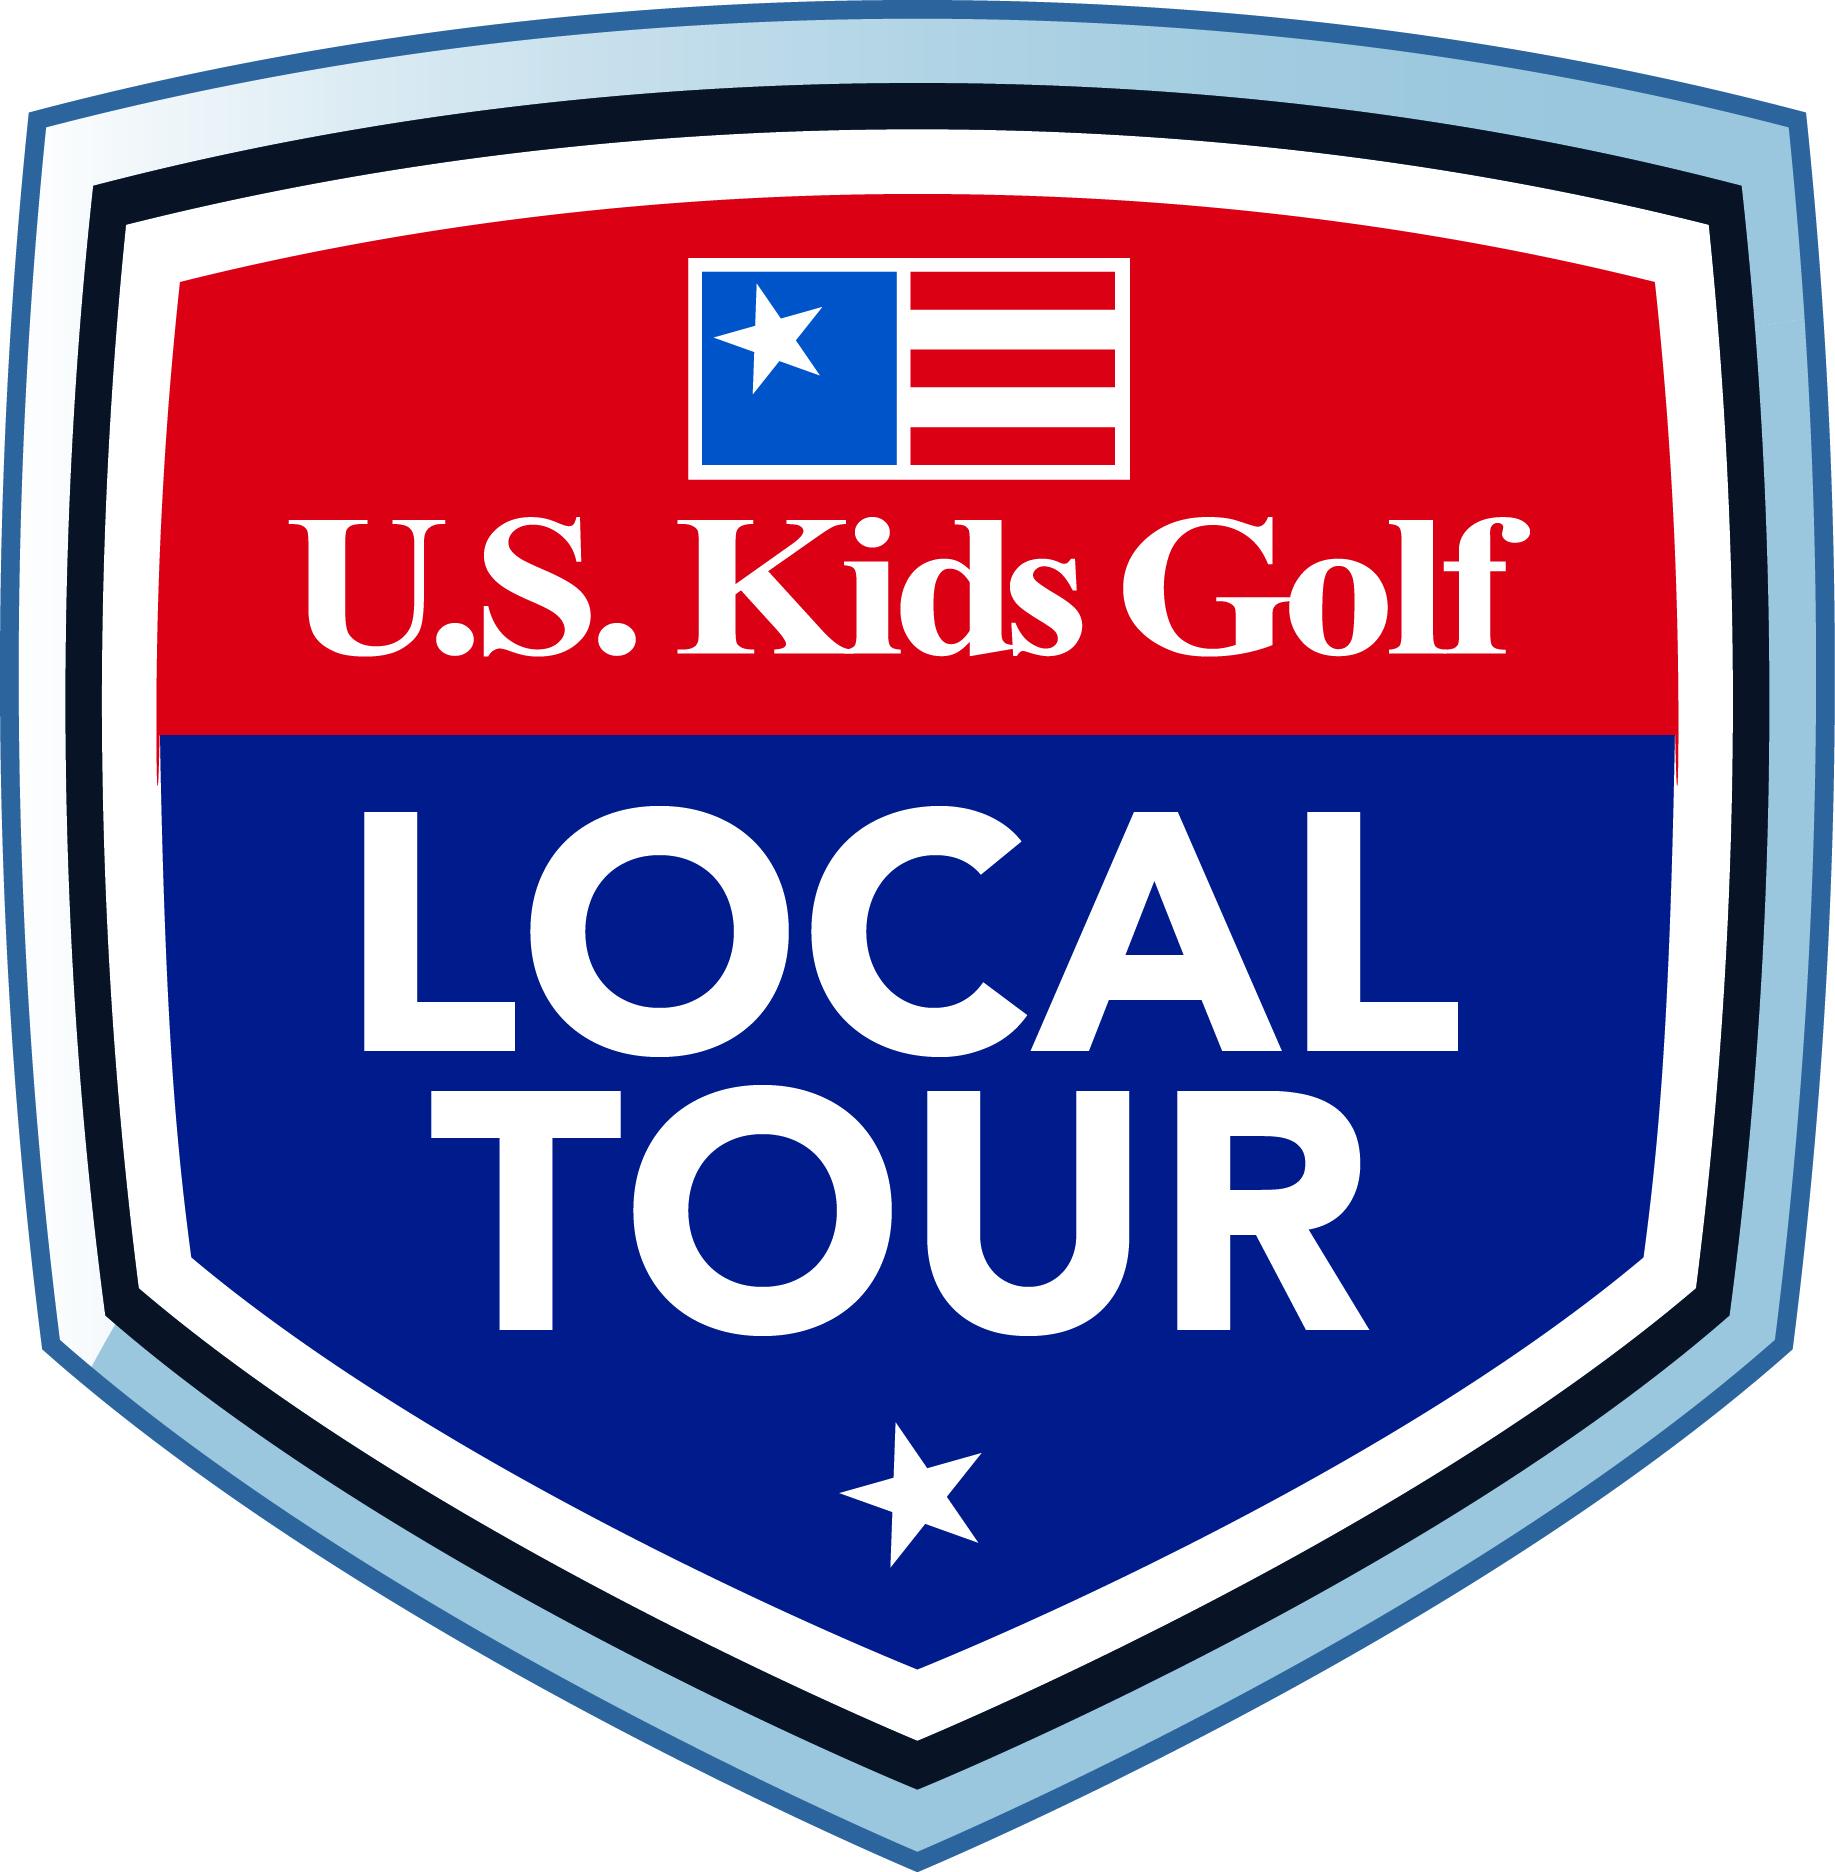 US Kids Golf - Austin Local Tour